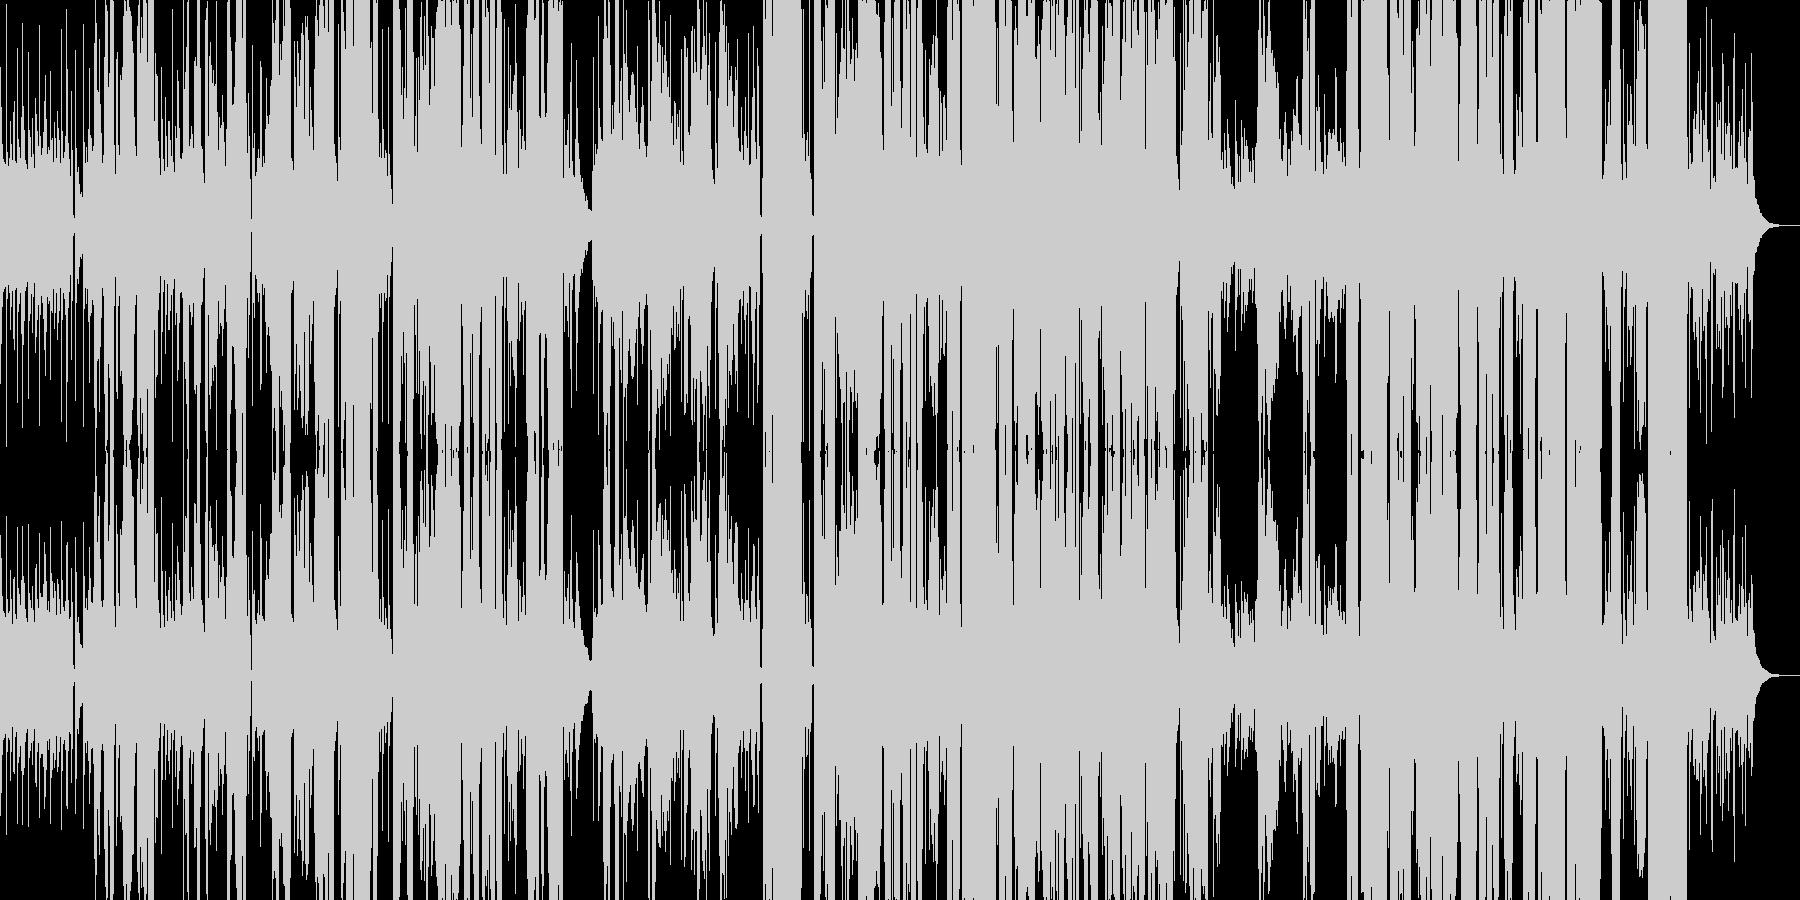 Blues-like pop music's unreproduced waveform